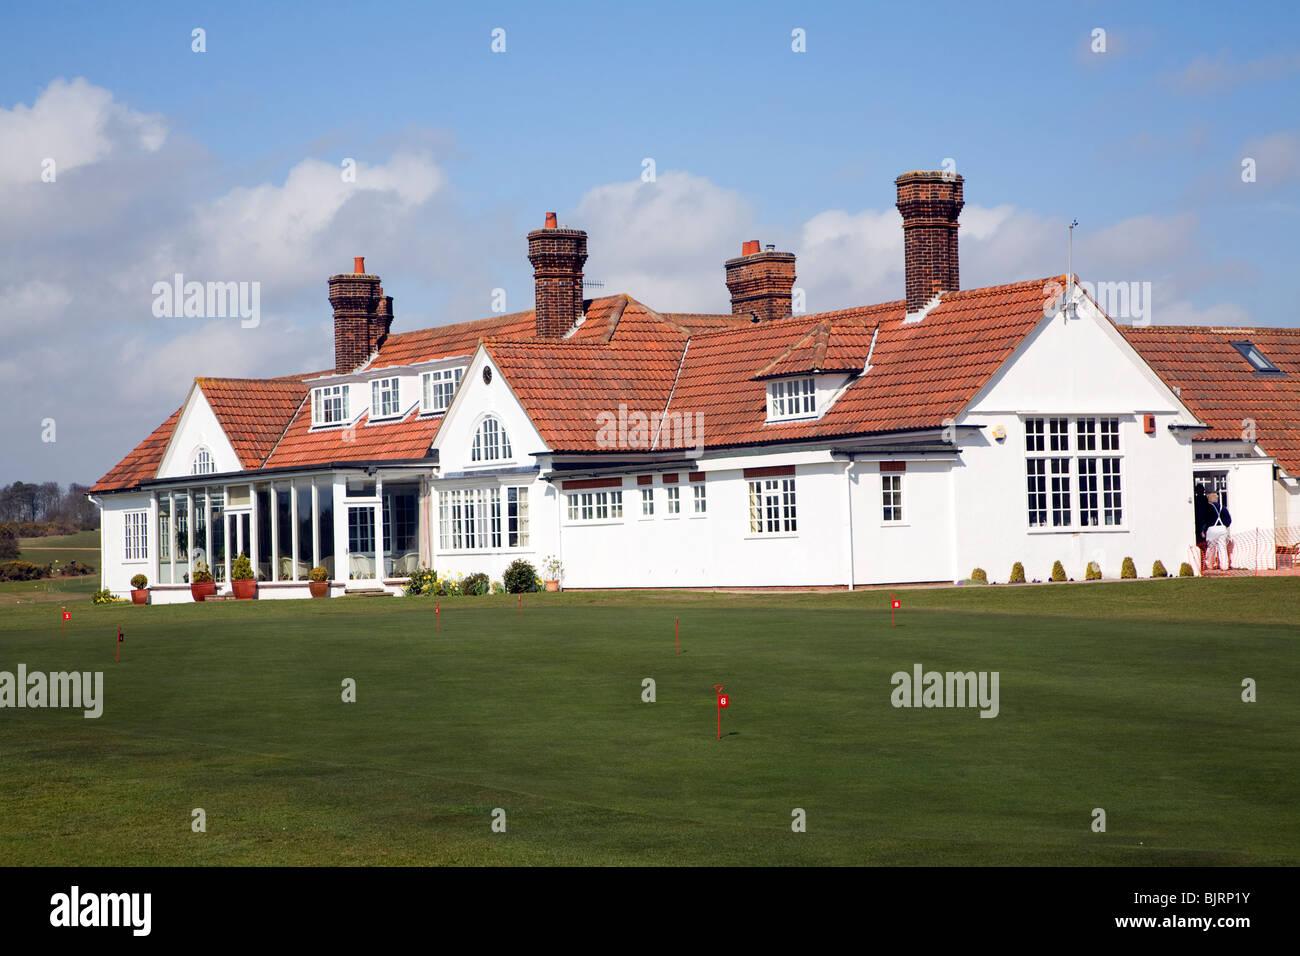 Golf club clubhouse Aldeburgh, Suffolk - Stock Image